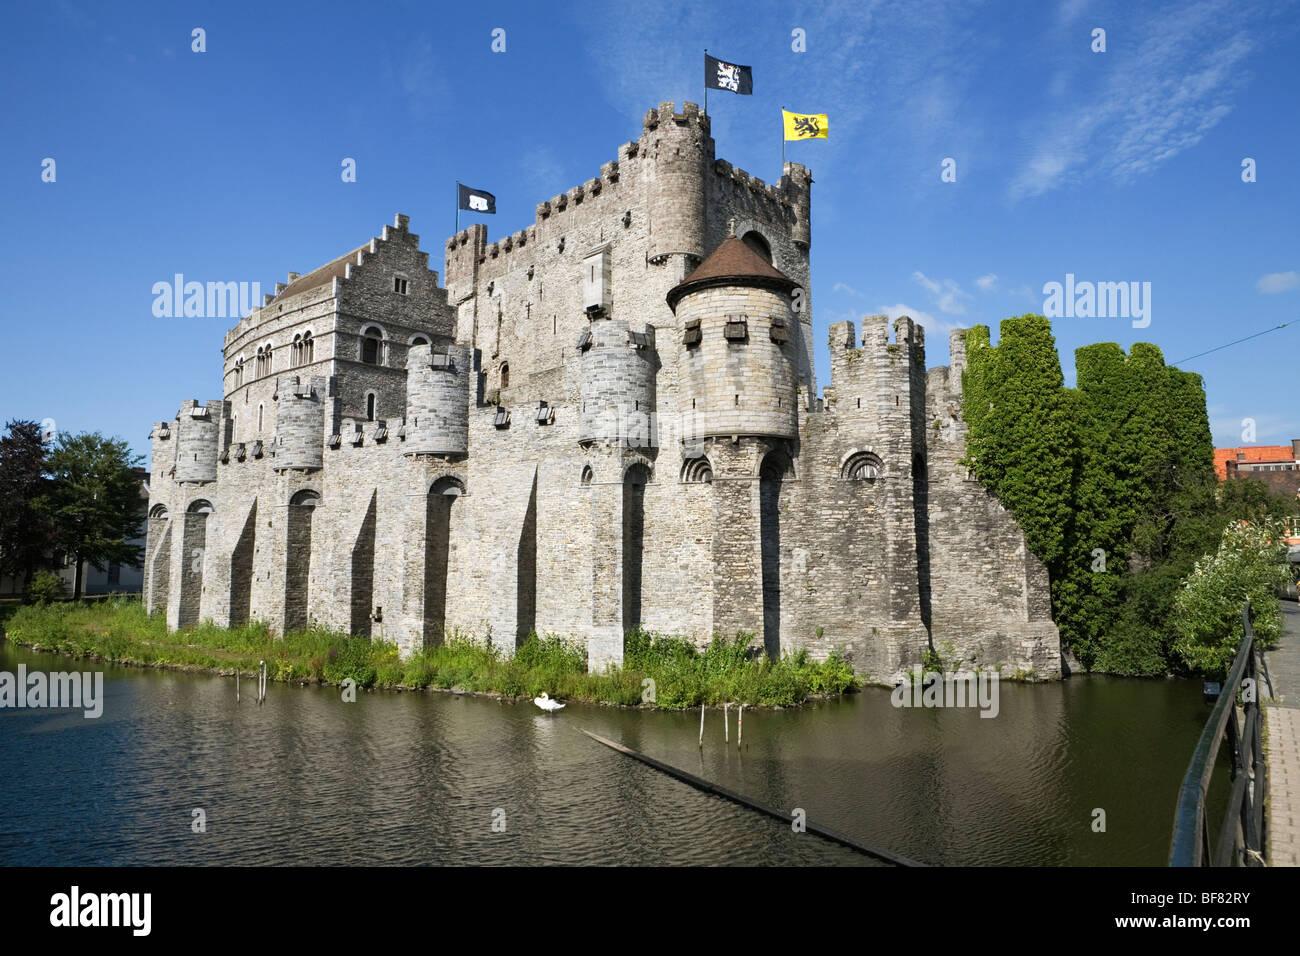 Gravensteen, castle of the Counts of Flanders. - Stock Image